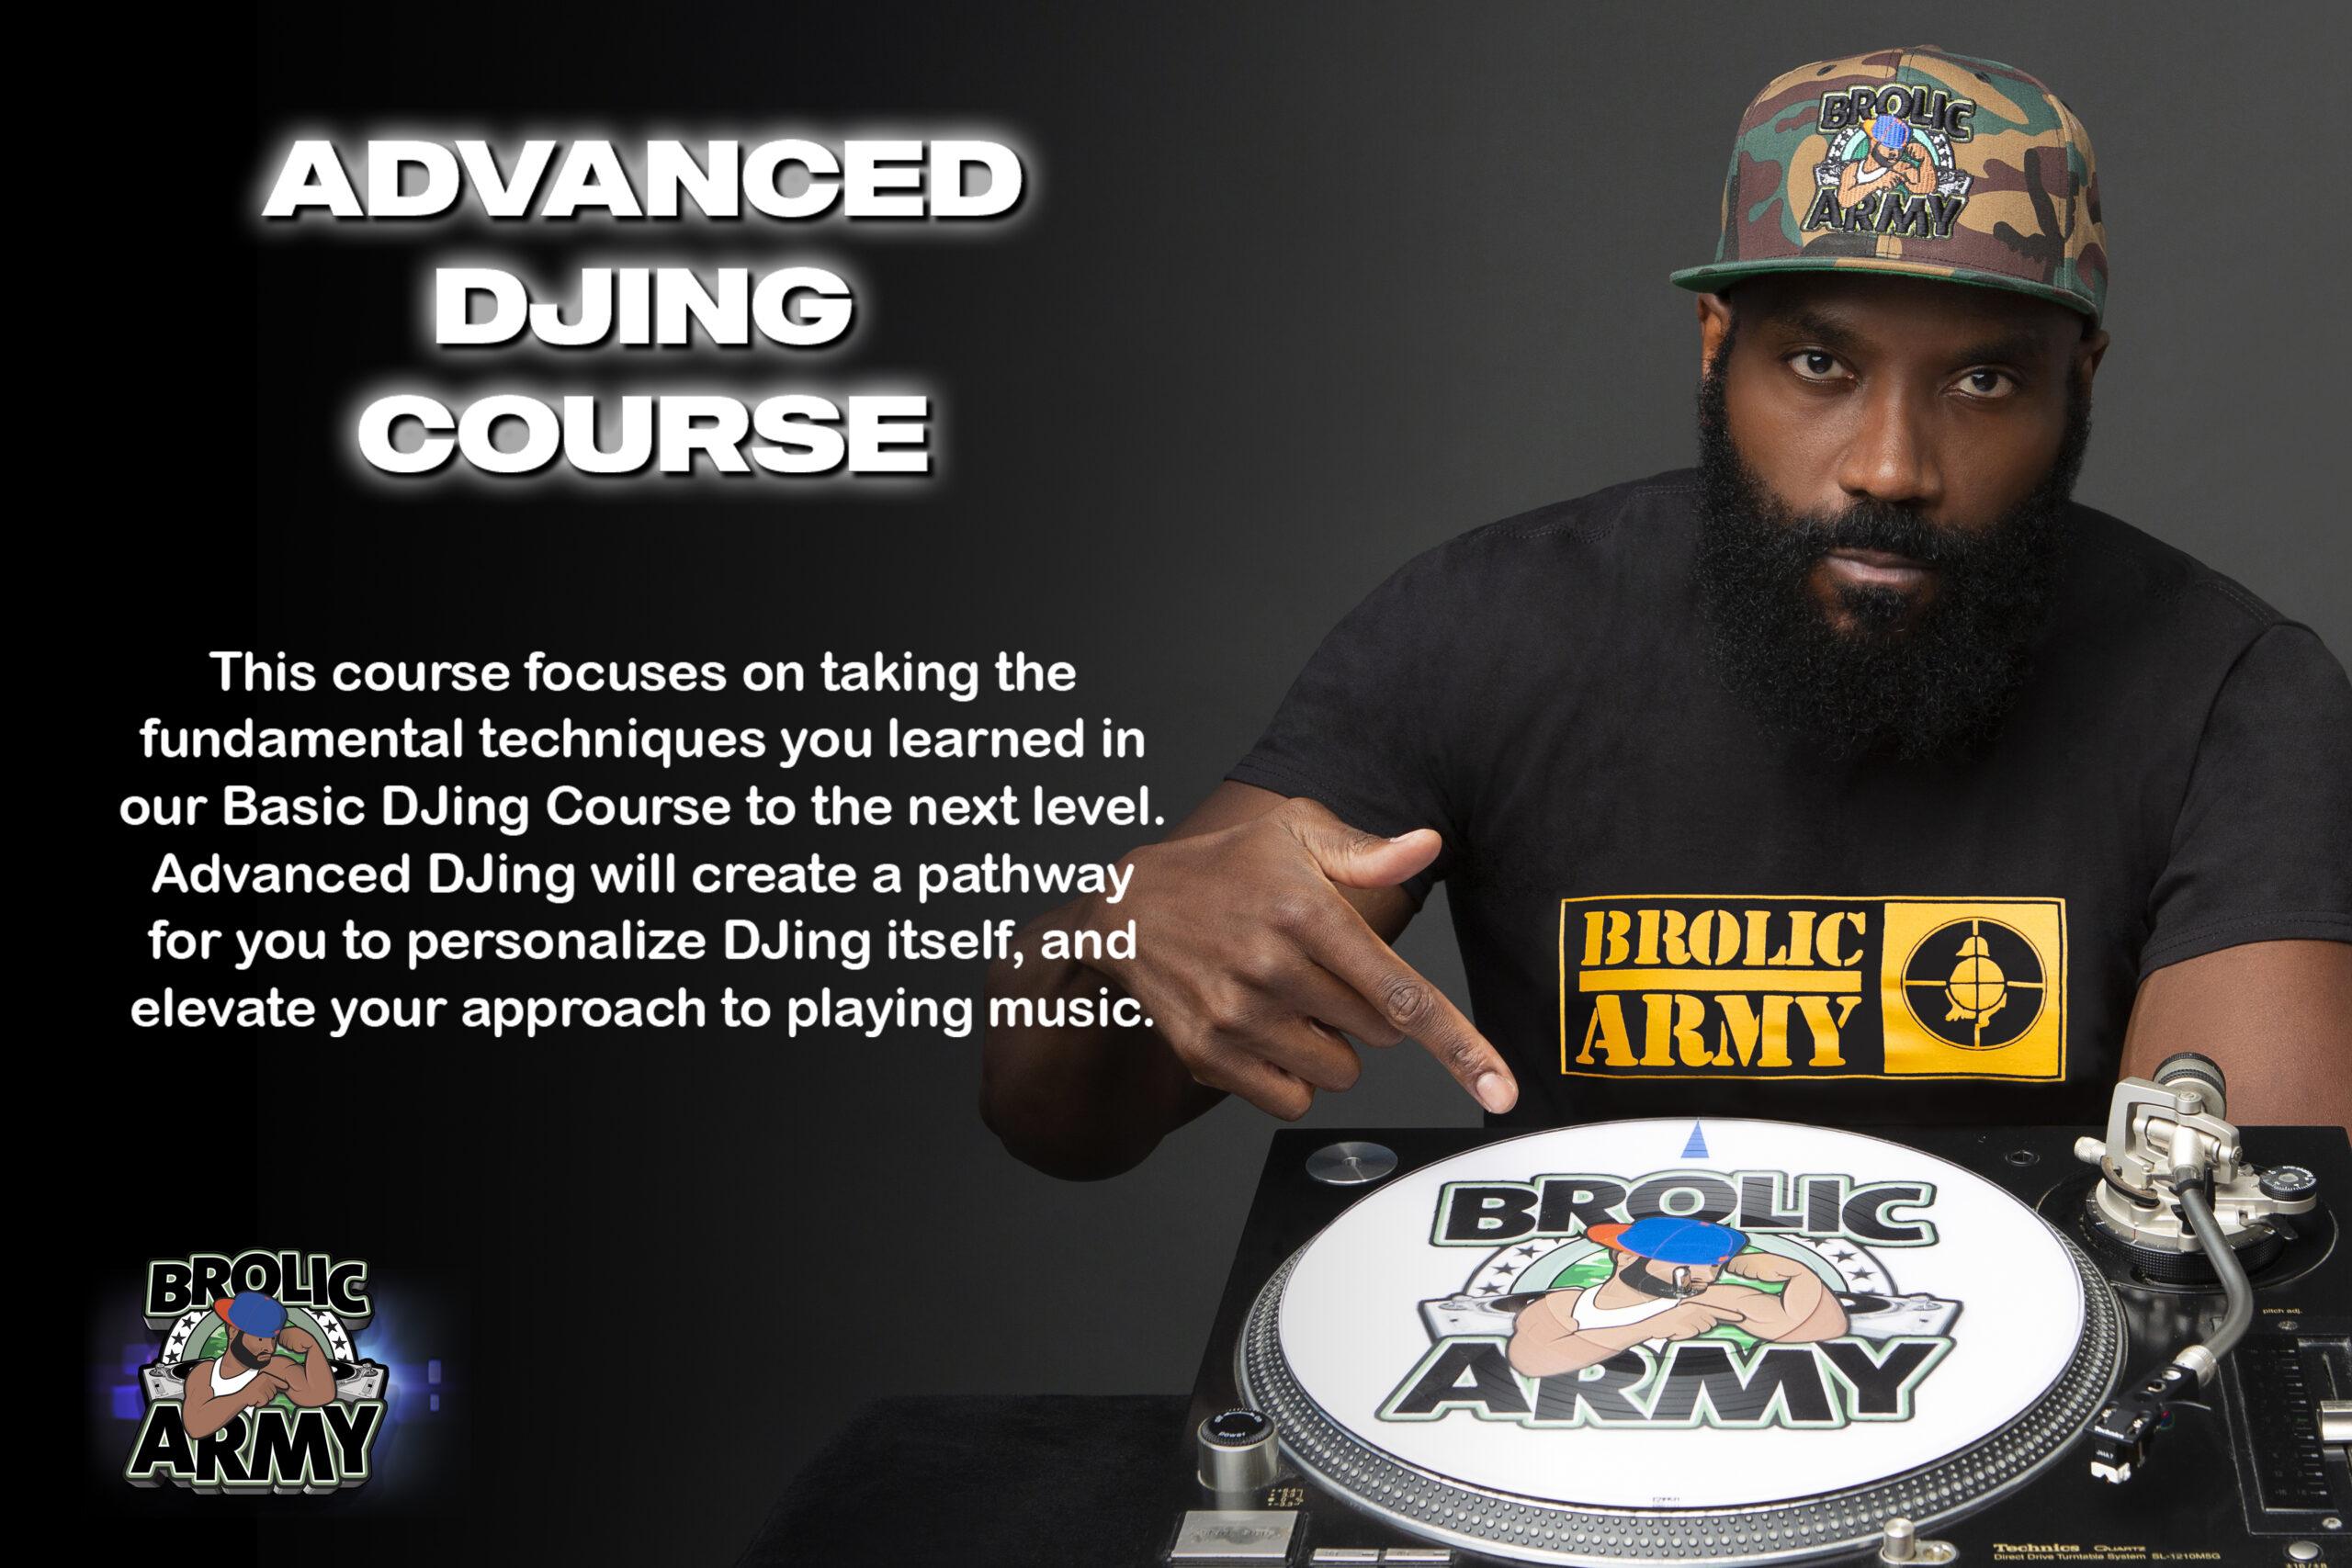 Advanced DJing